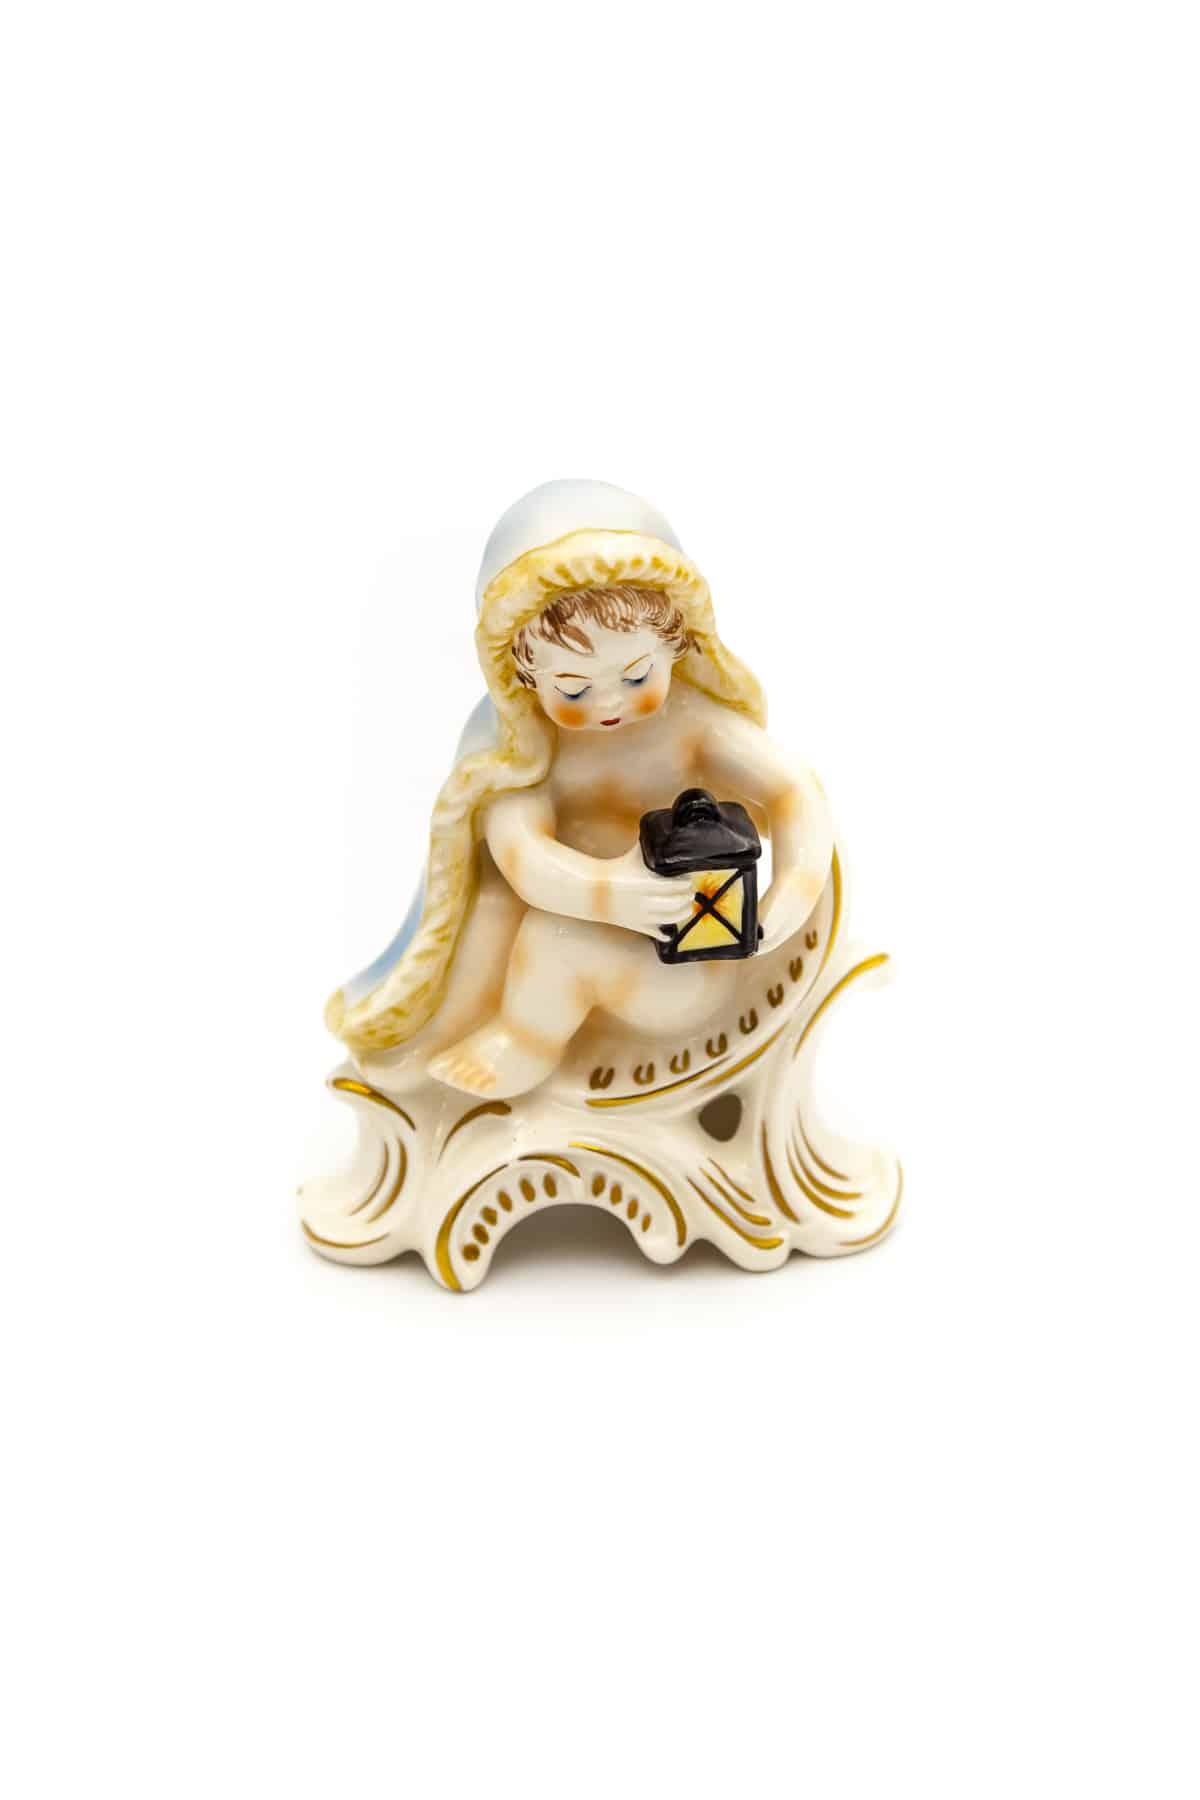 farforovaya statuetka malchik s fonaryom